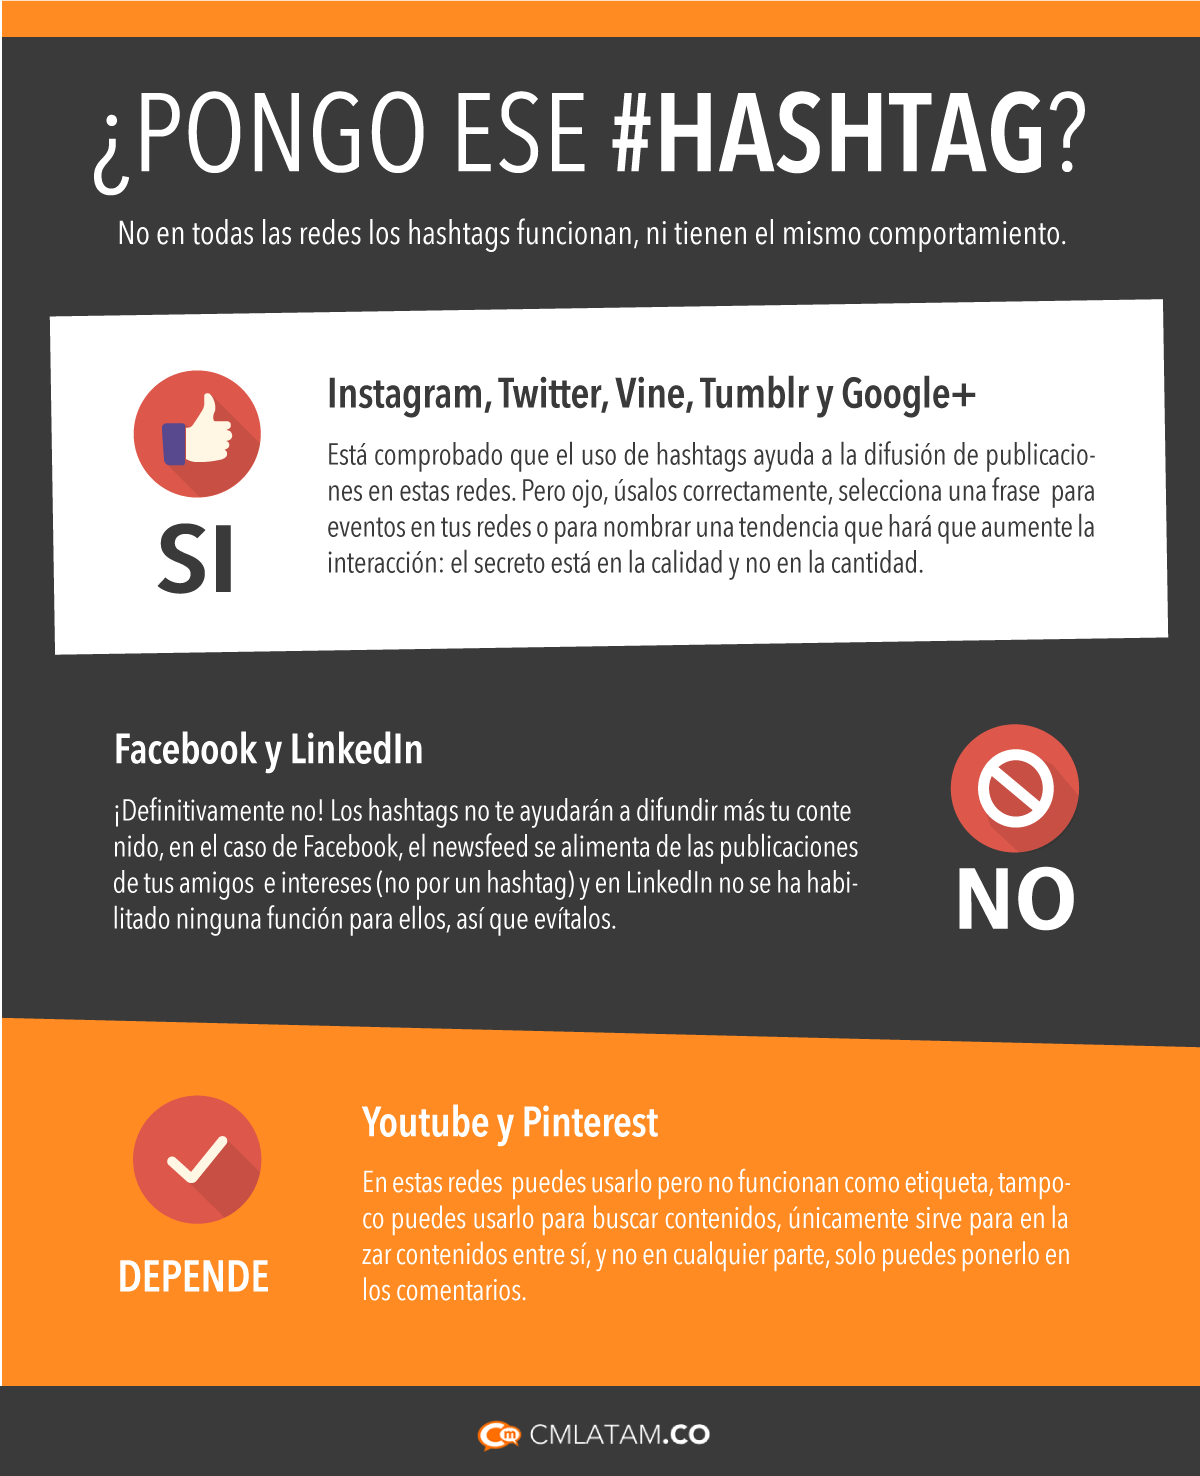 Pongo-ese-hashtag